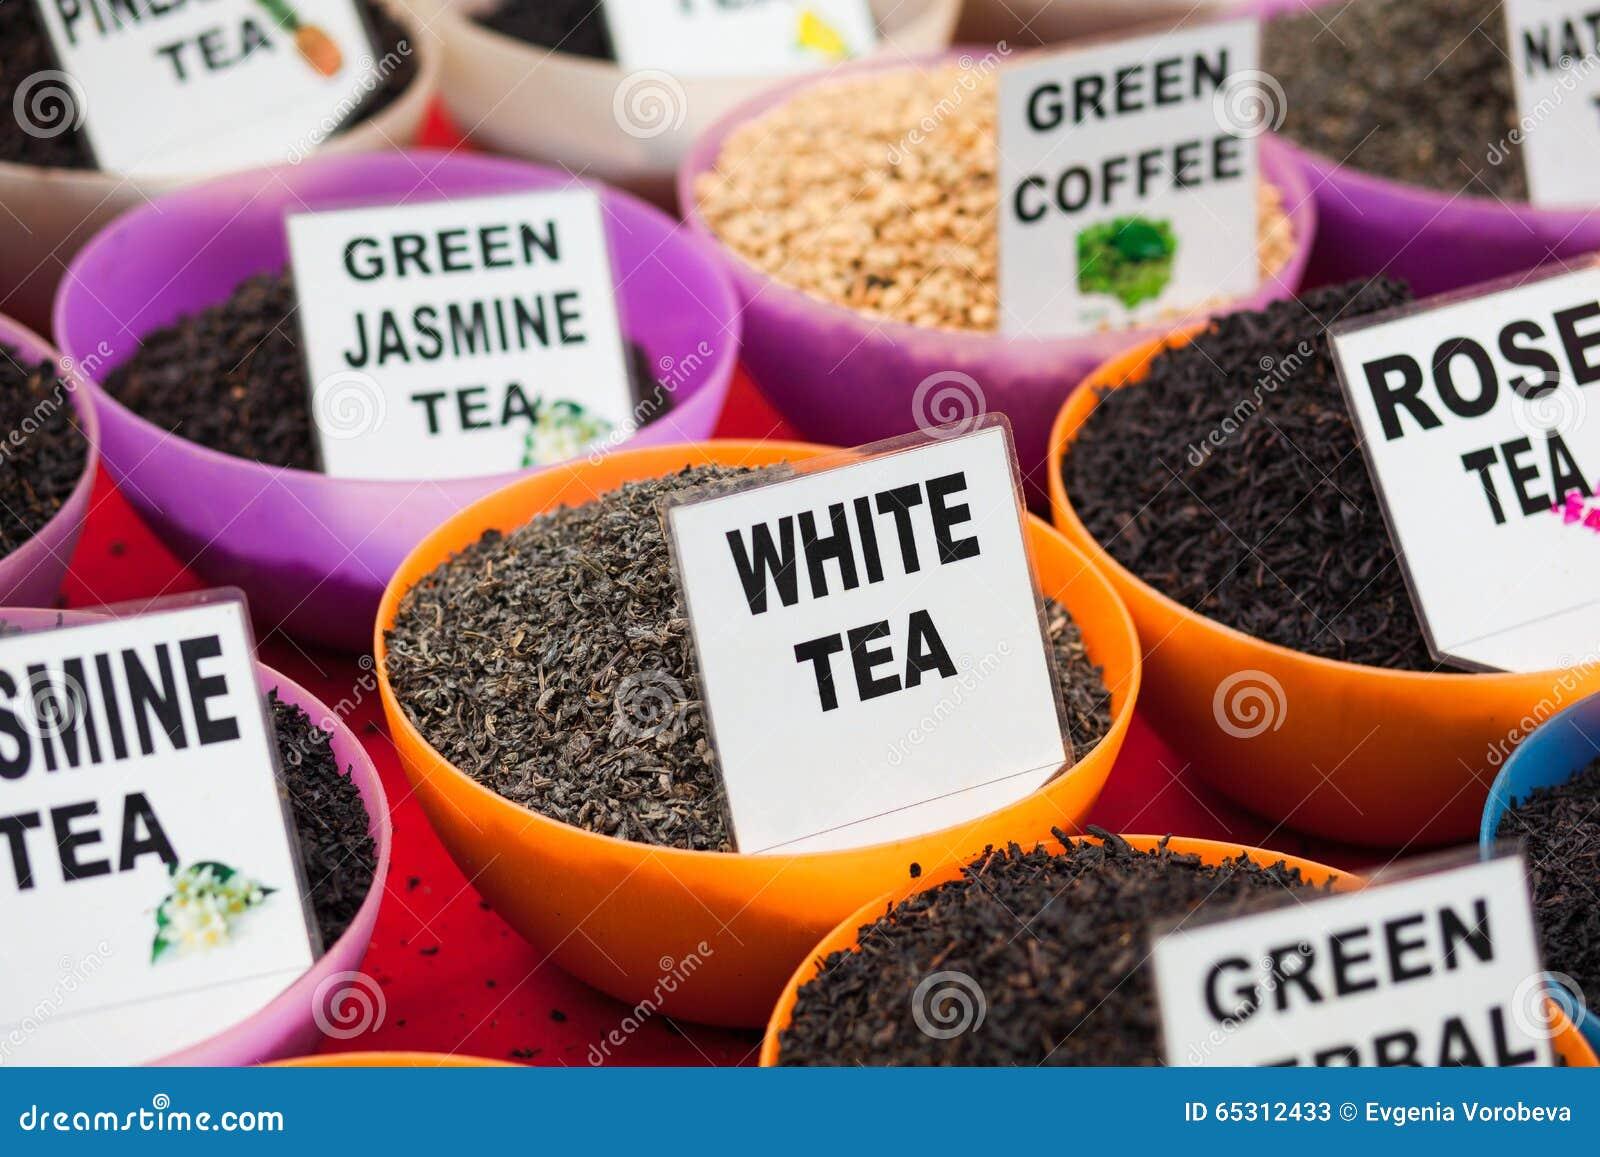 Types Of Tea In India